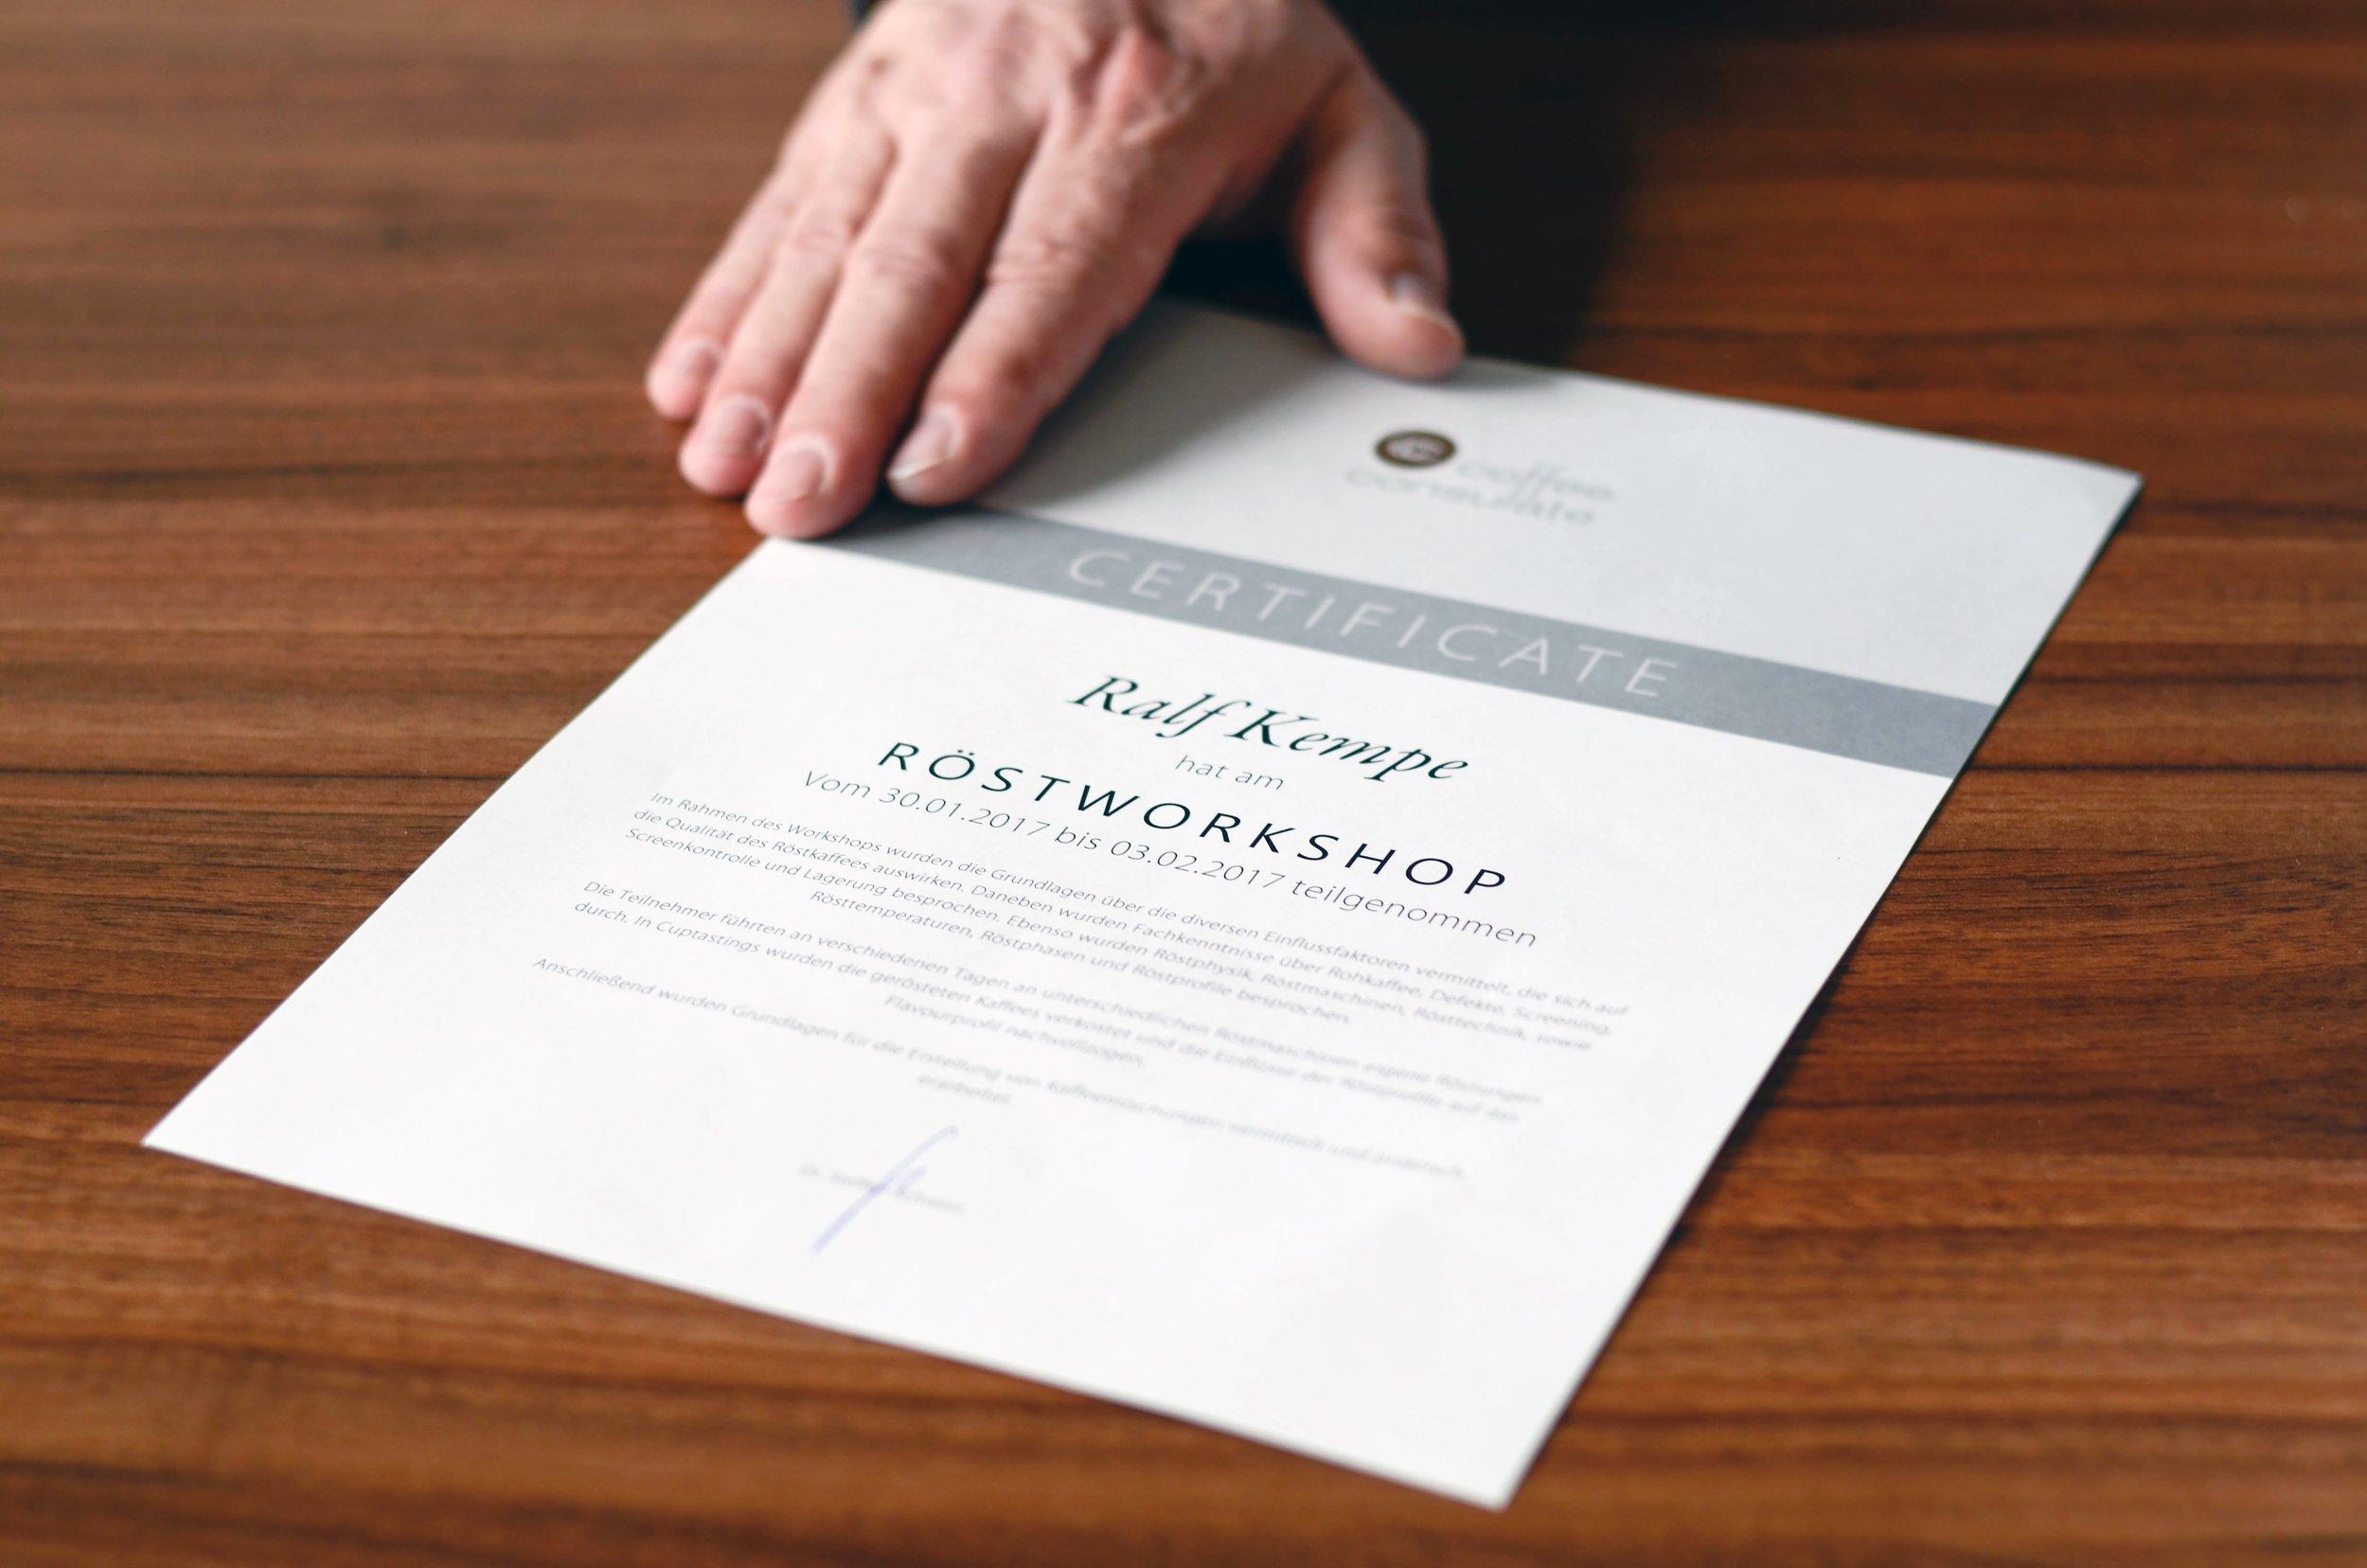 Die Urkunde. Foto: Marina Brockhoff für die © WEBER Packaging GmbH, 2017